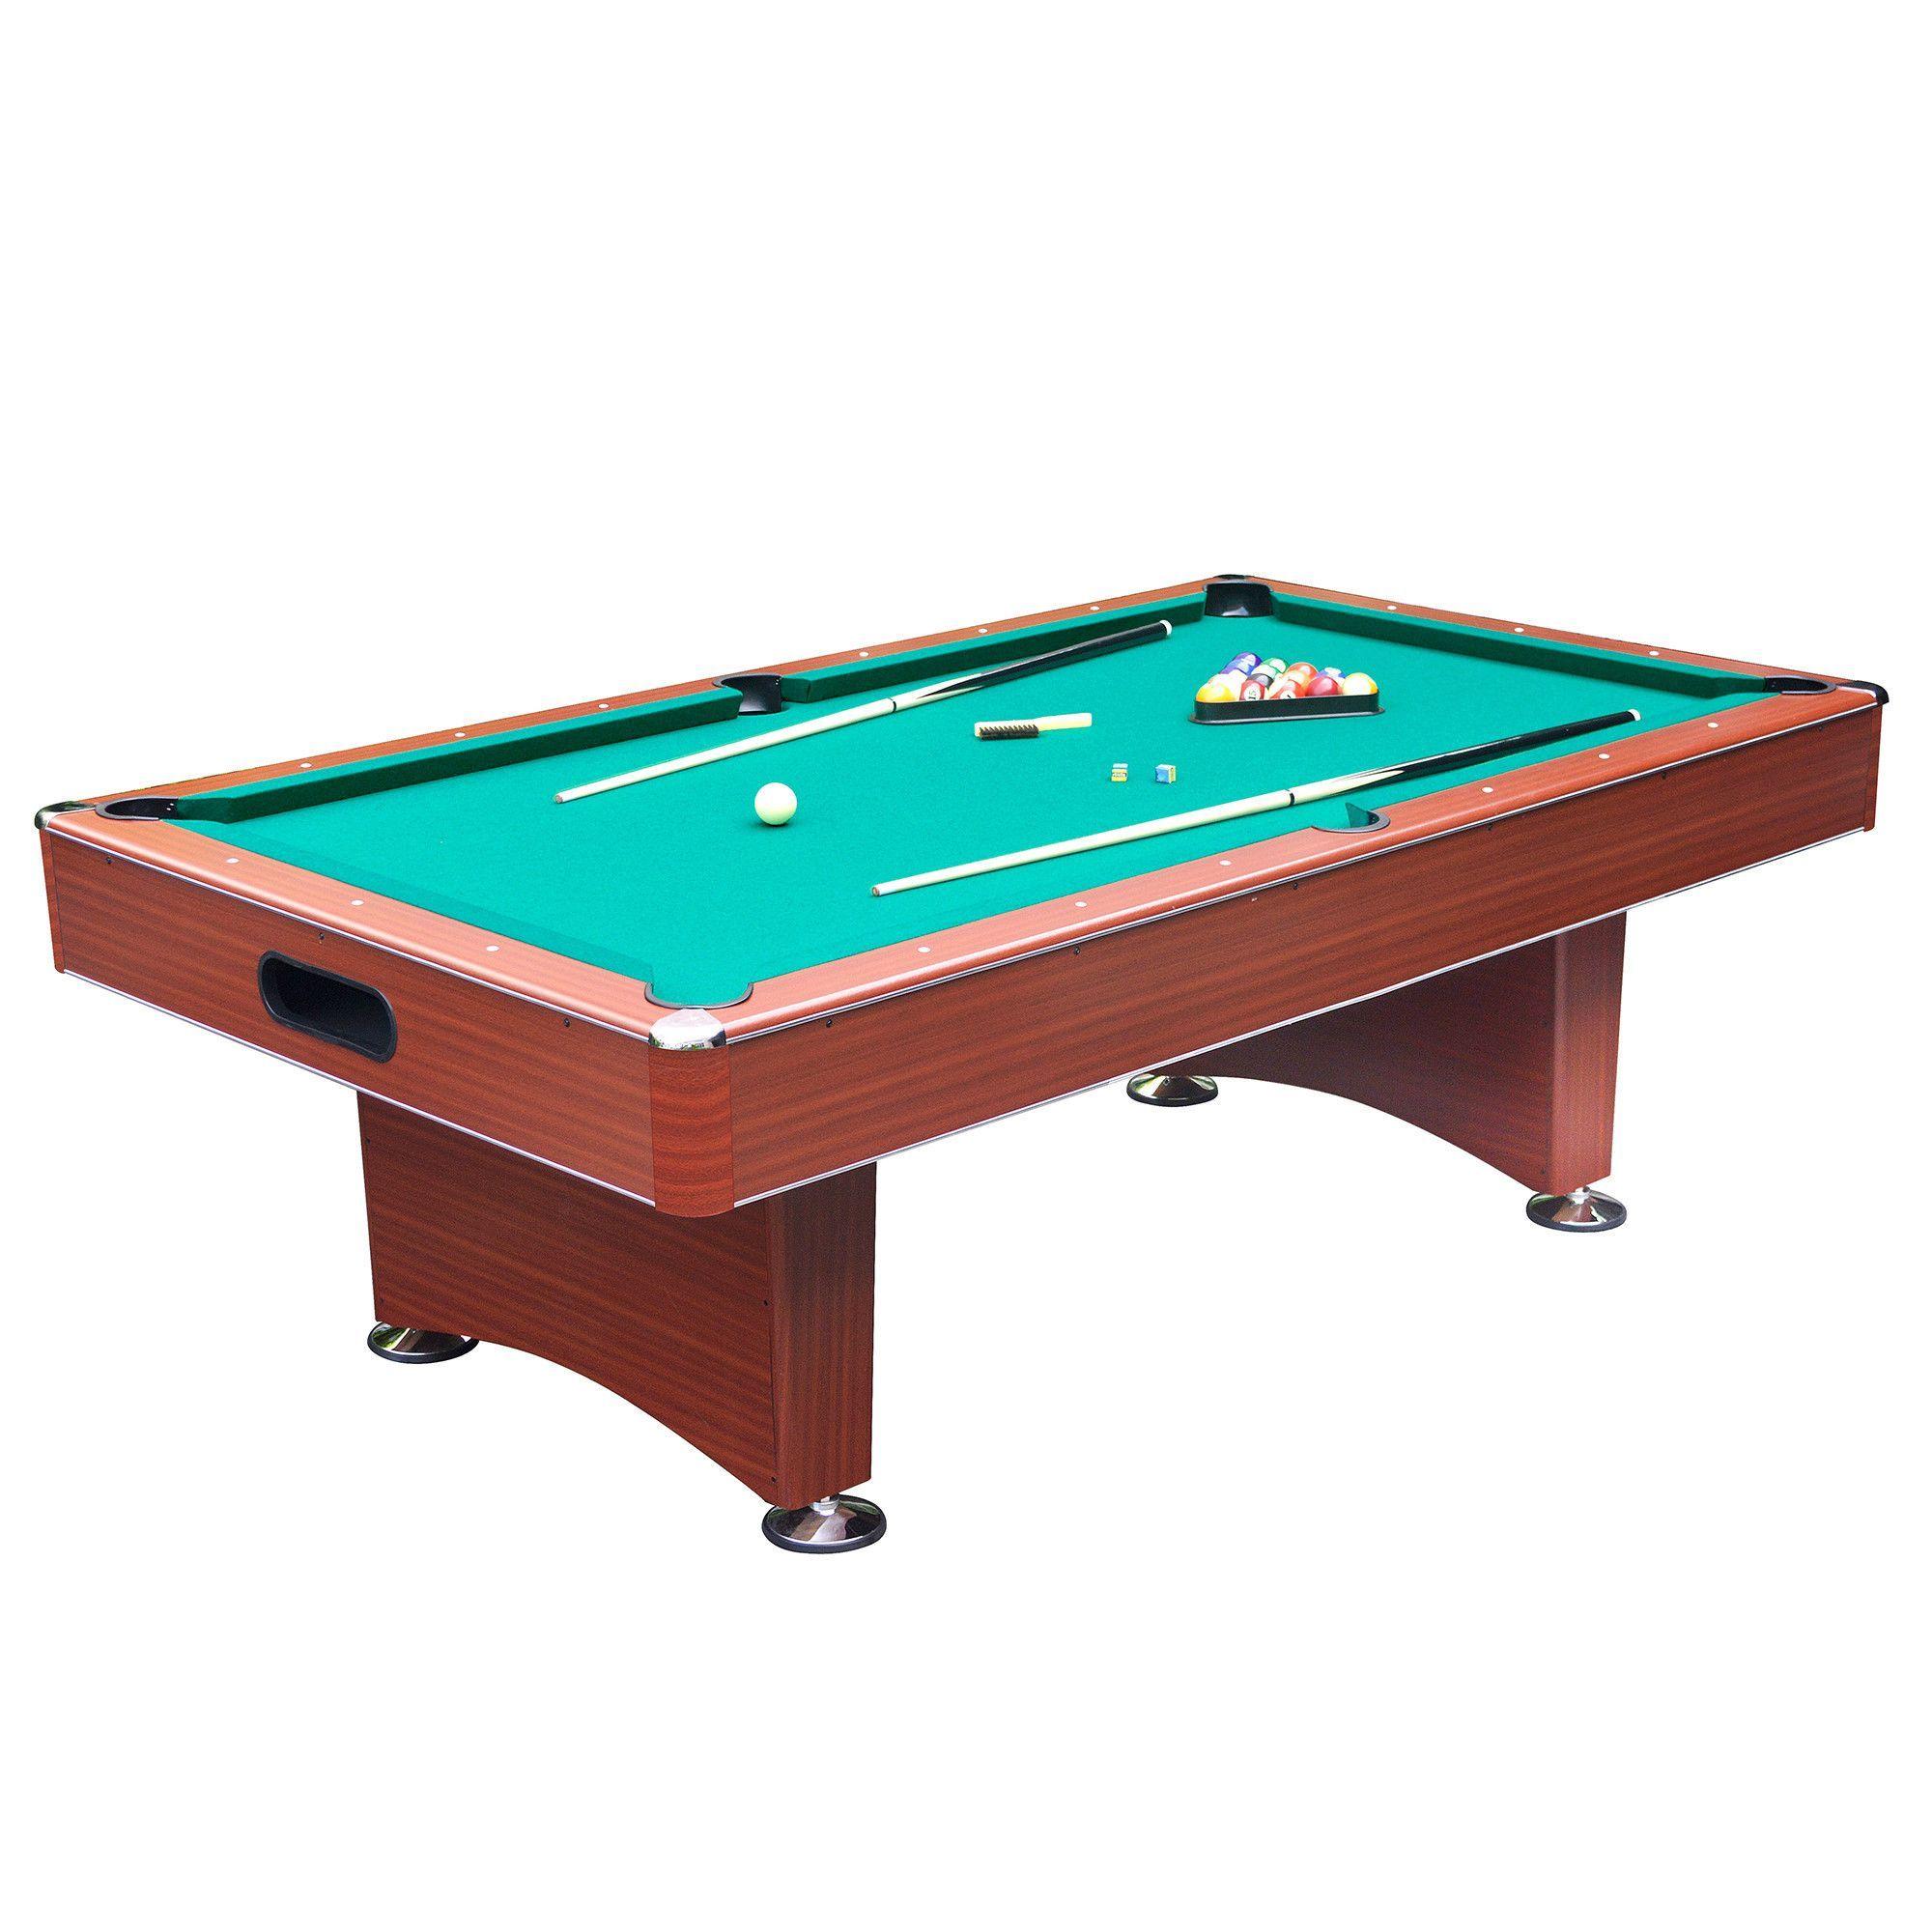 Carmelli Hathaway Sports Newport 8 Ft Deluxe Pool Table Internal